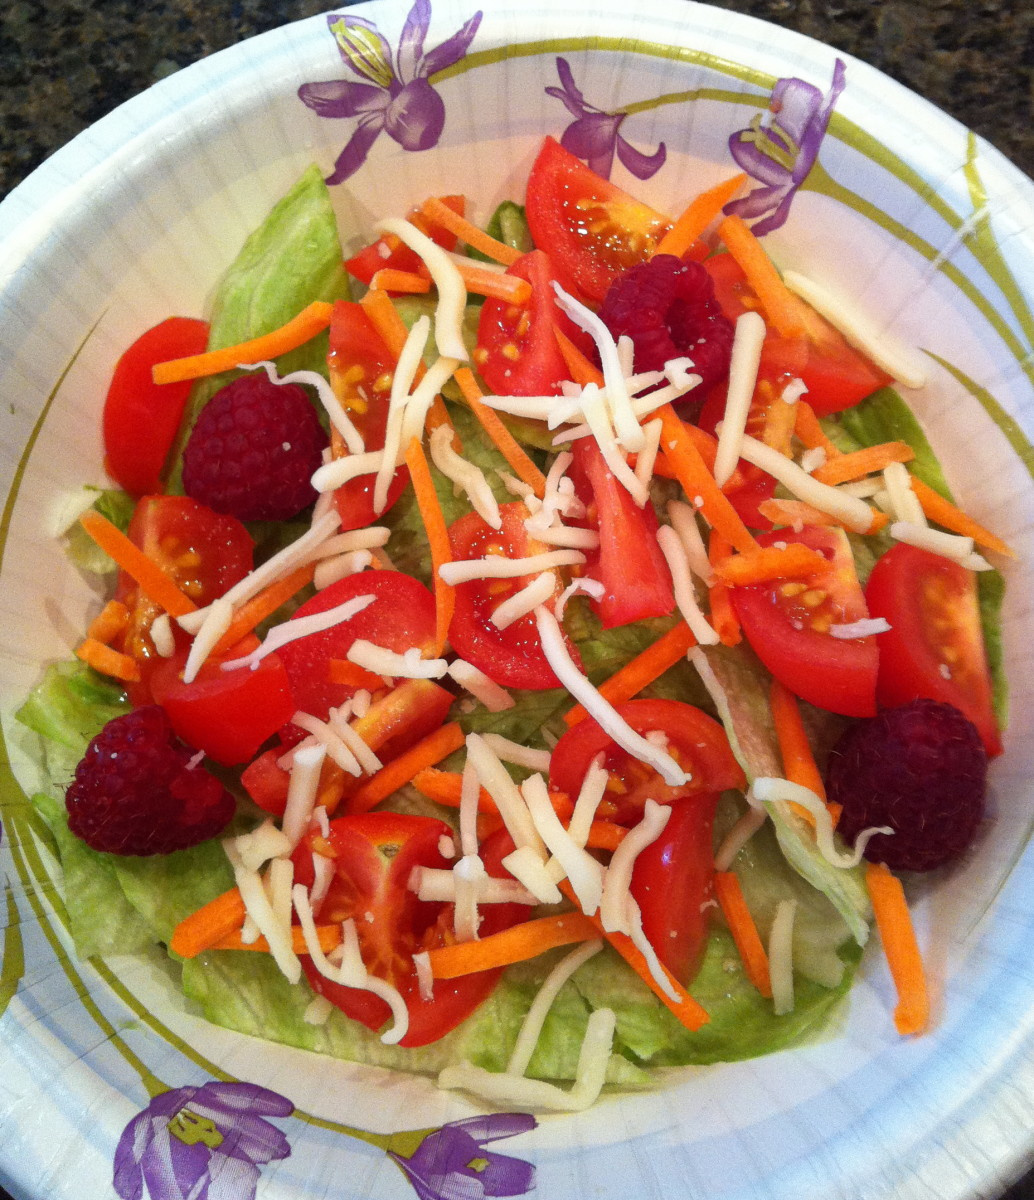 Raspberry and Tomato Salad Recipe